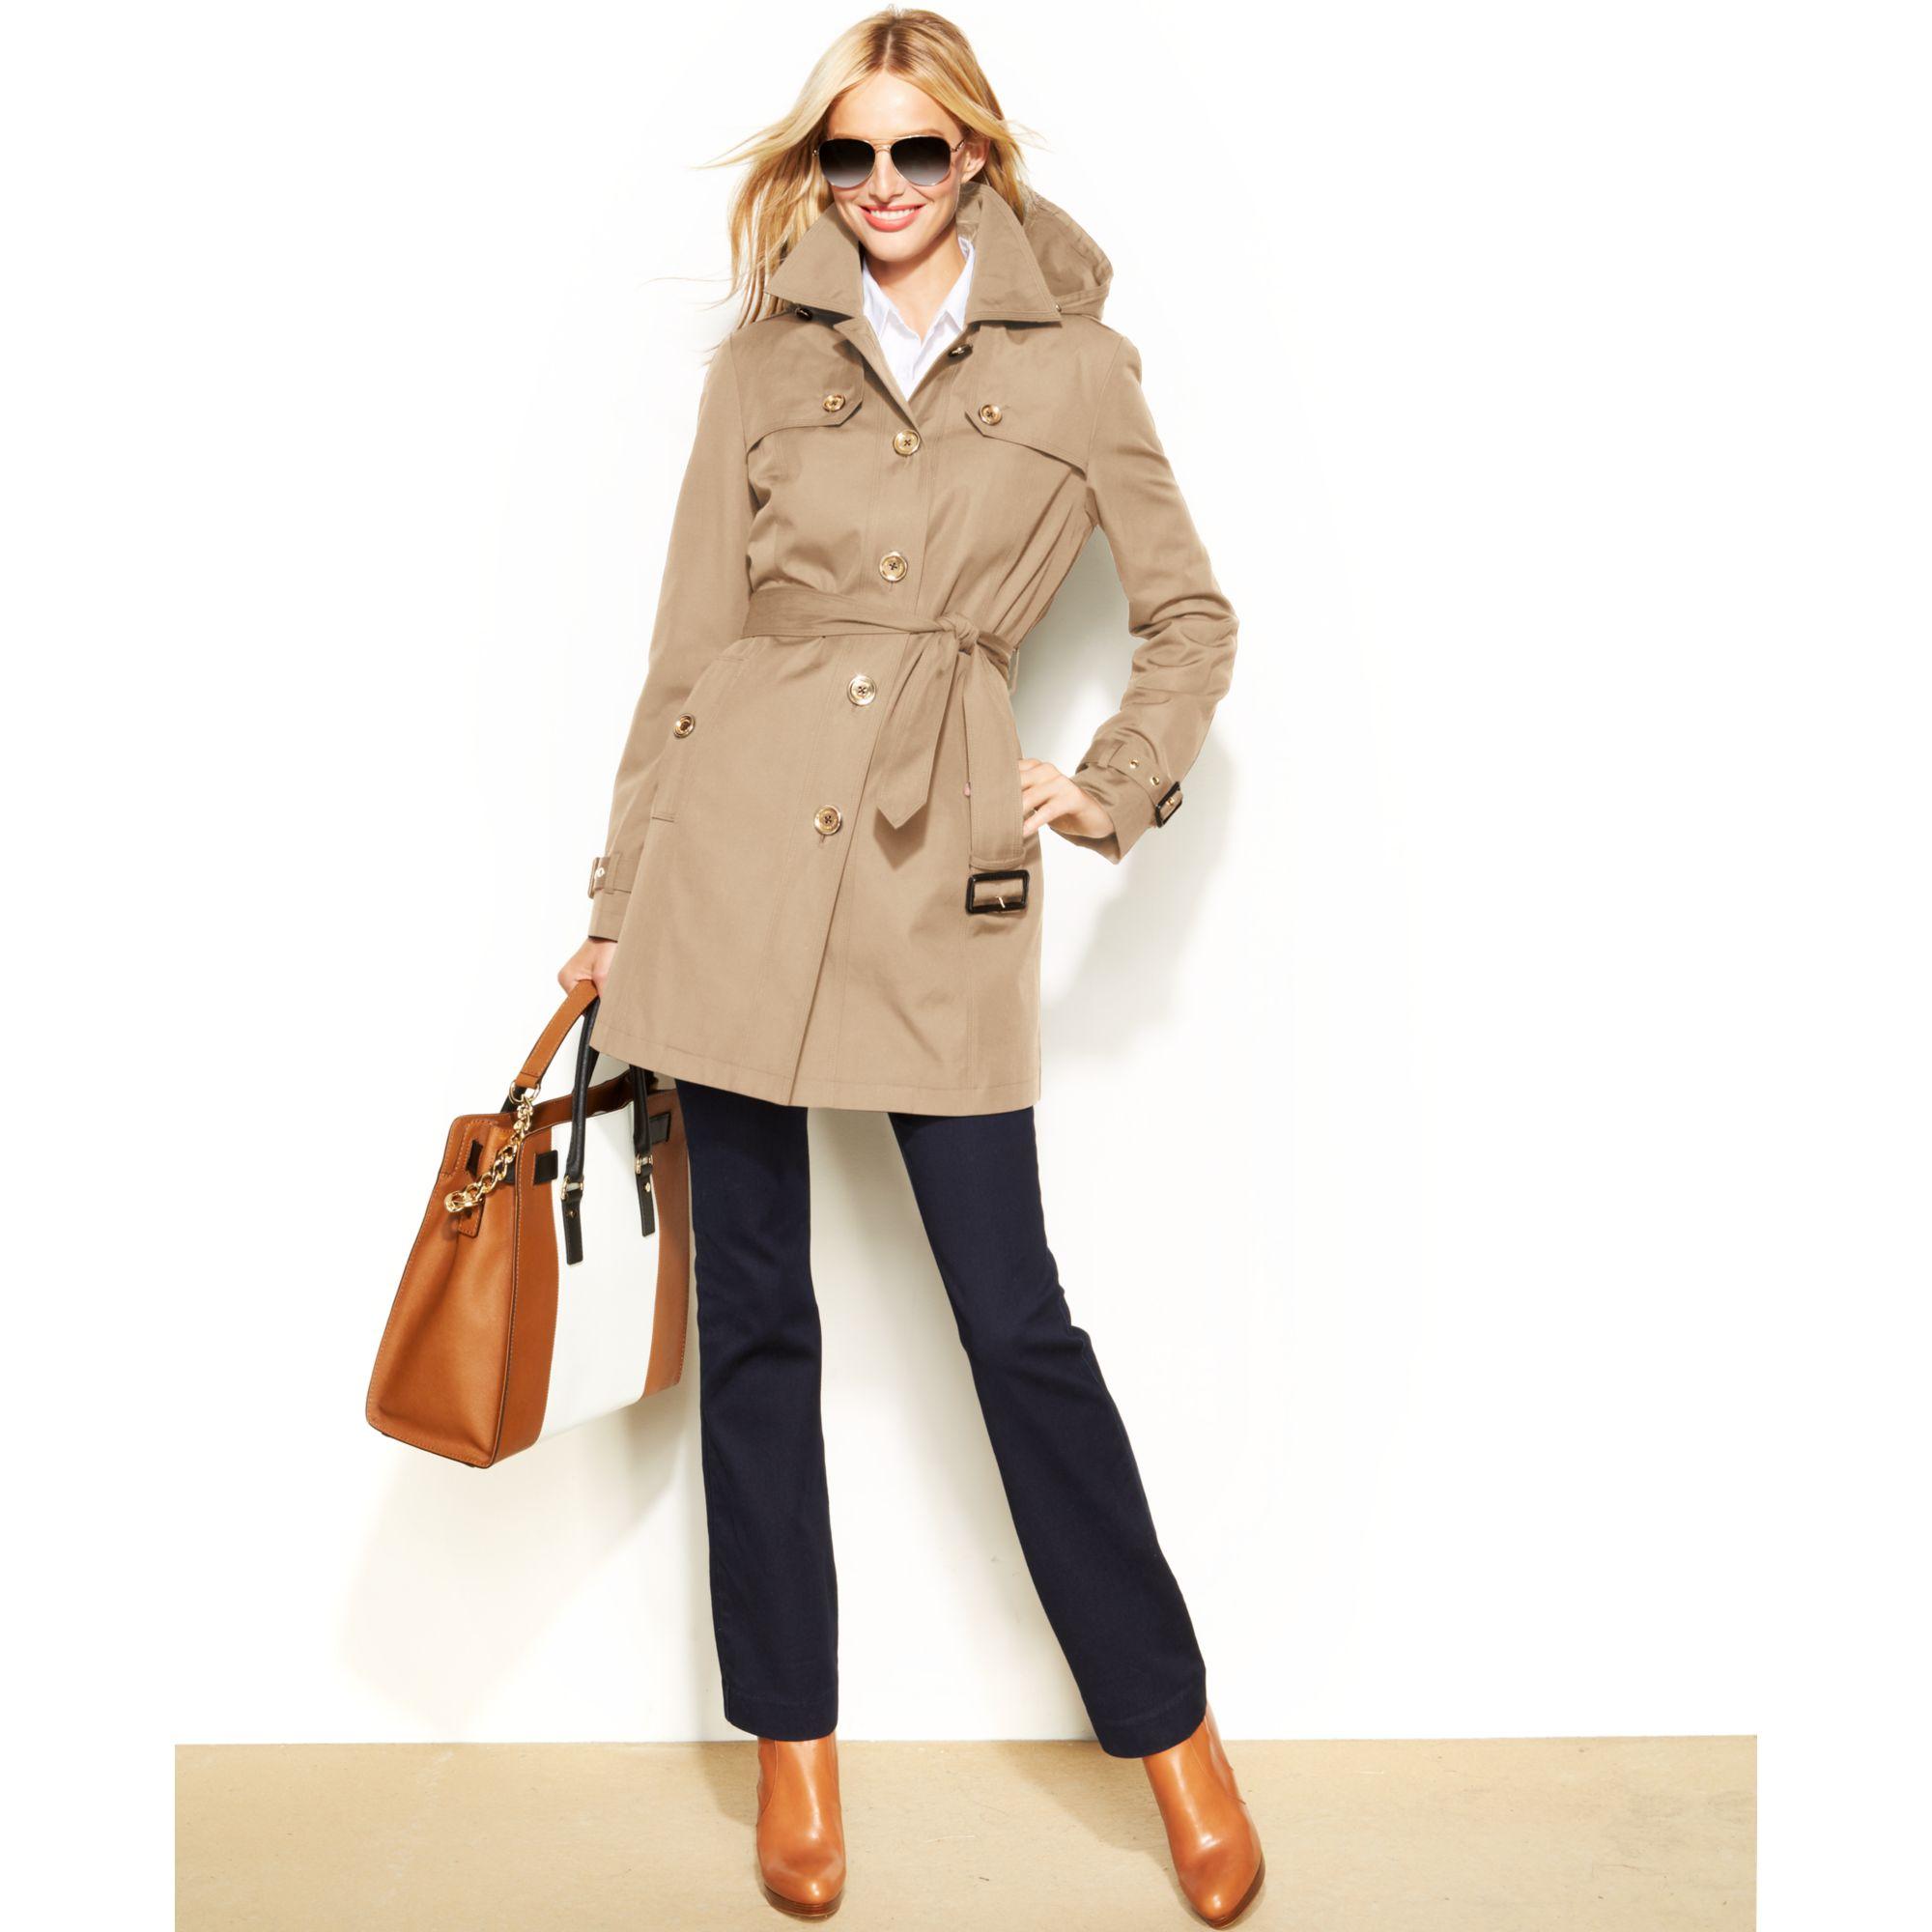 9f27cb3e36ac Michael Kors Women S Belted Hooded Trench Coat - The Best Belt Produck